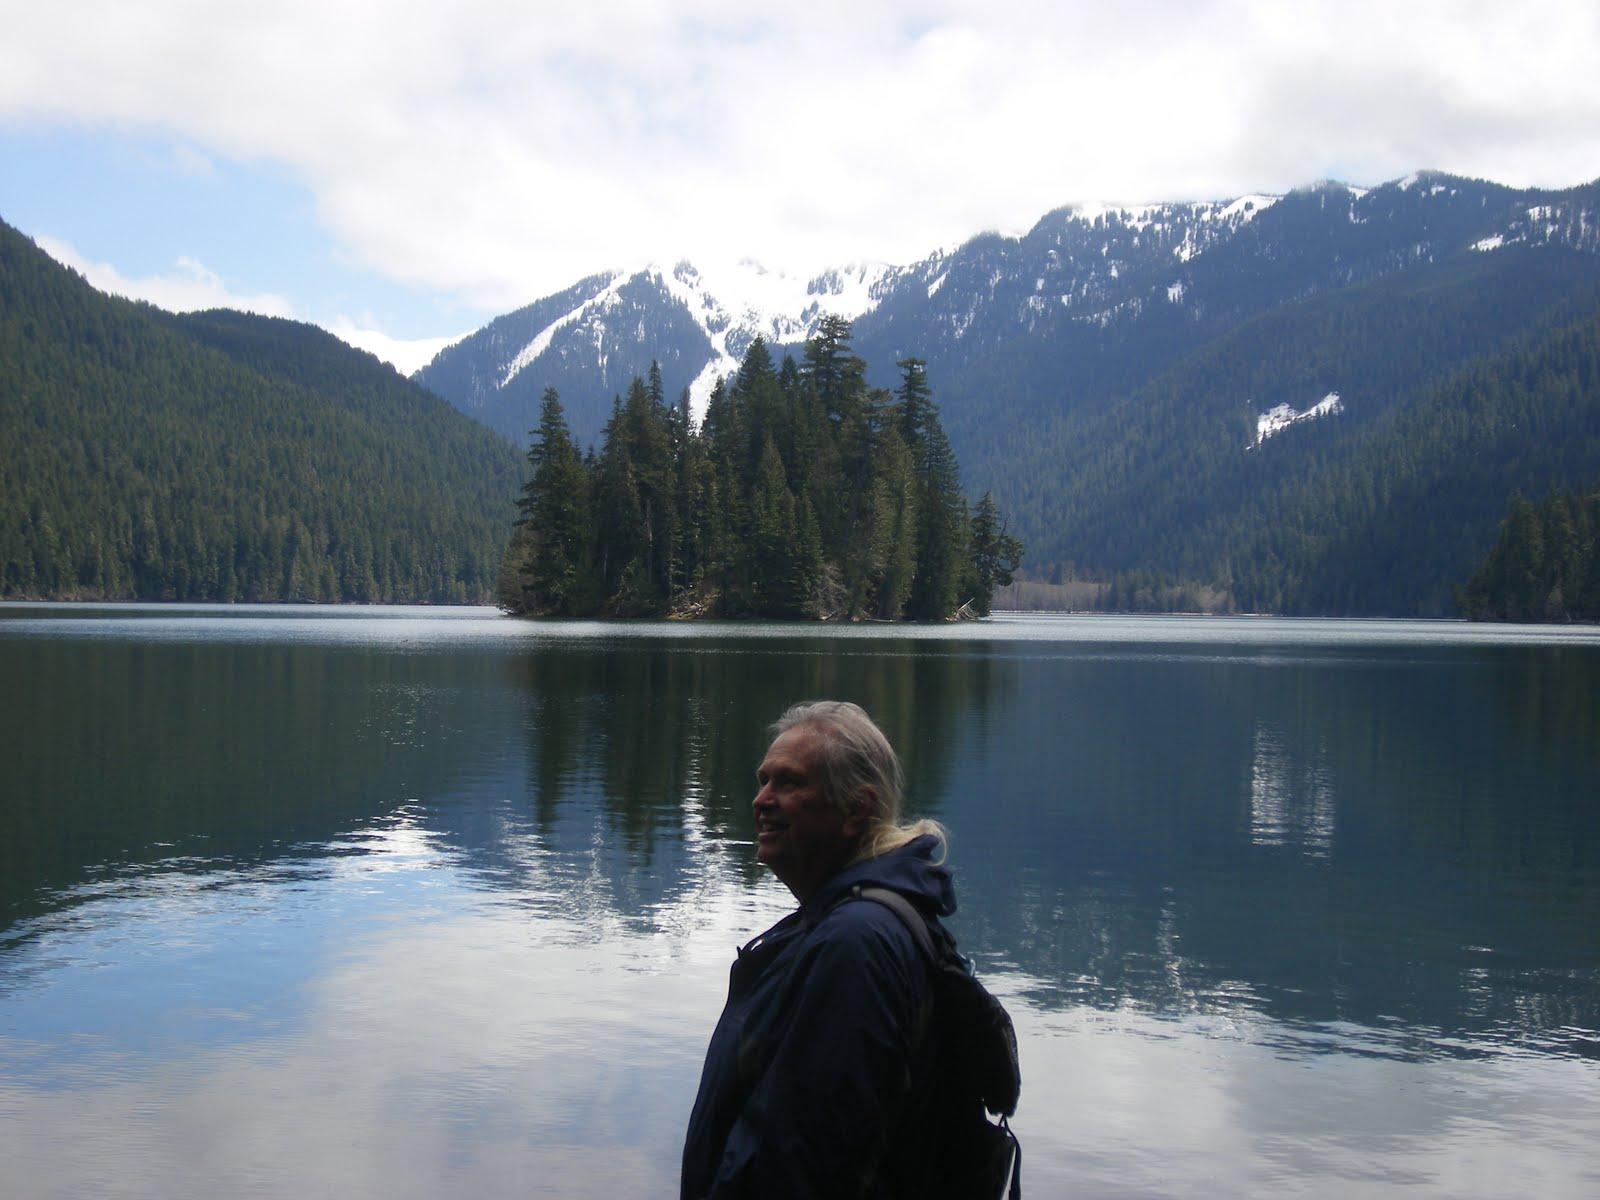 North to Alaska Packwood RV Park Washington and Mt Rainier